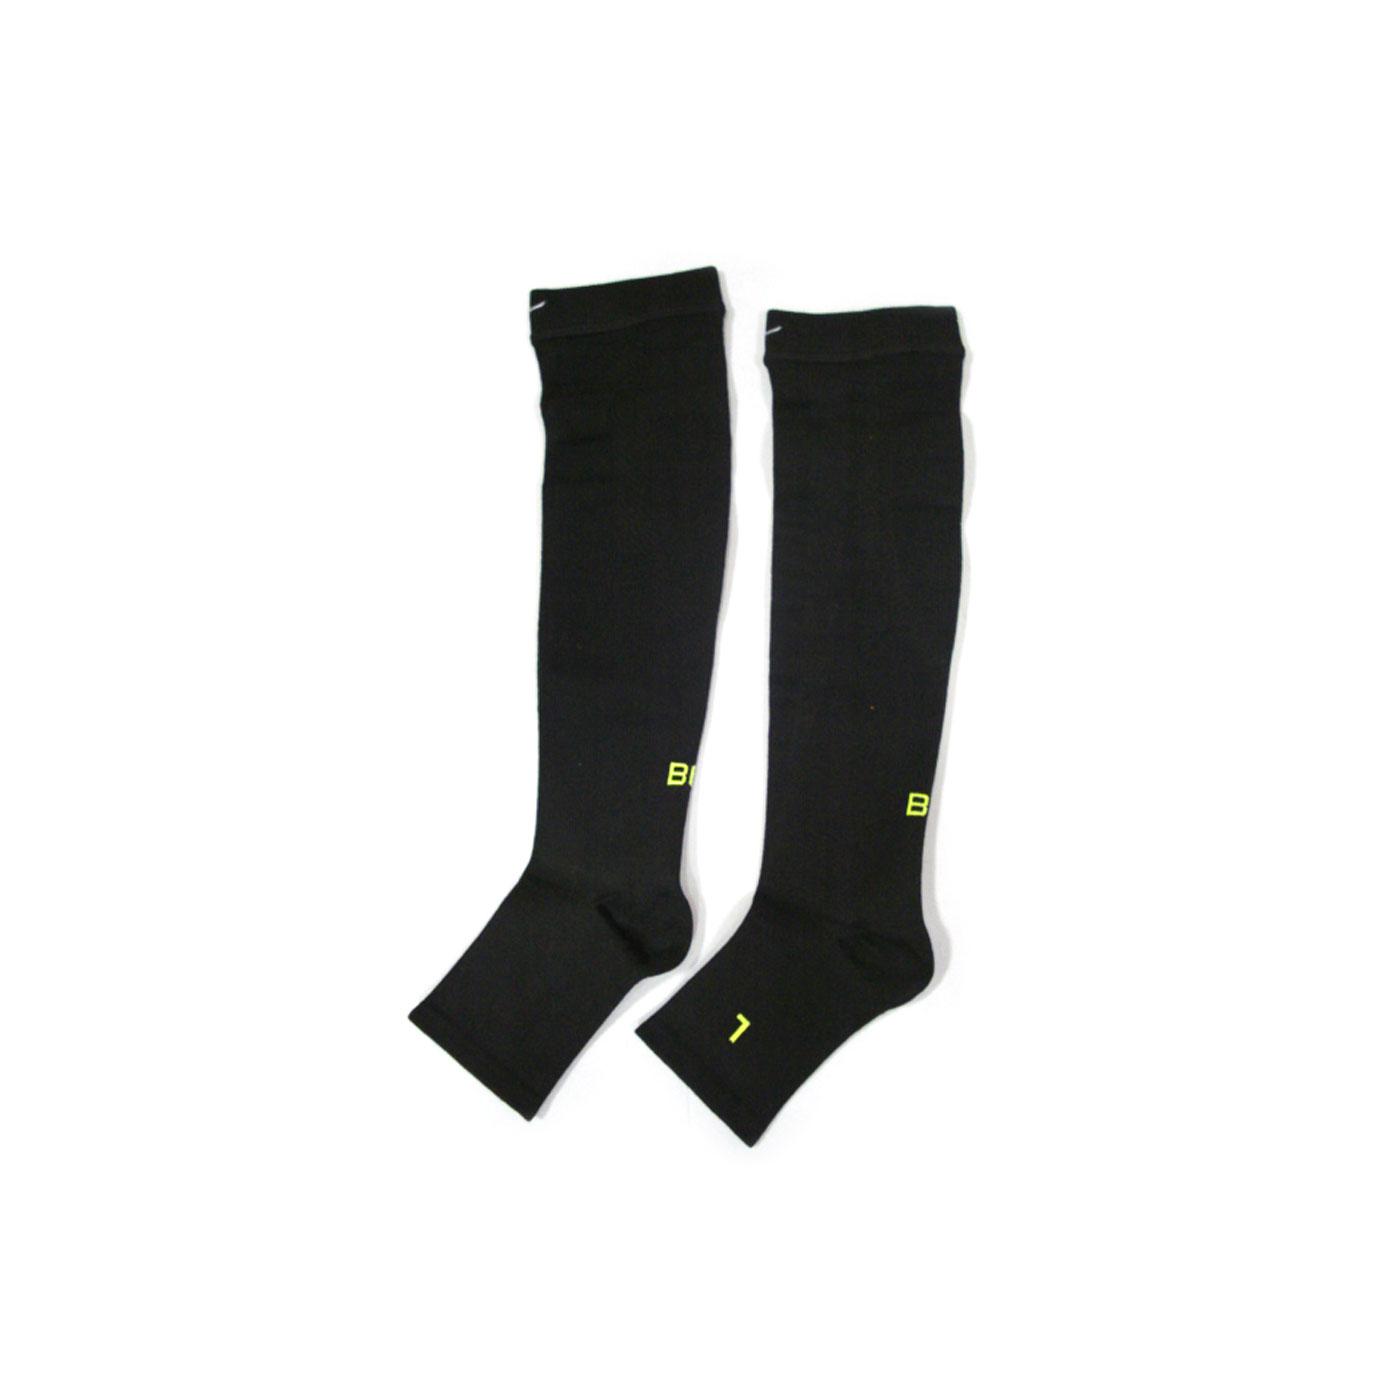 MIZUNO 日製-BG 襪套 K2JJ4A5009 - 黑芥末綠